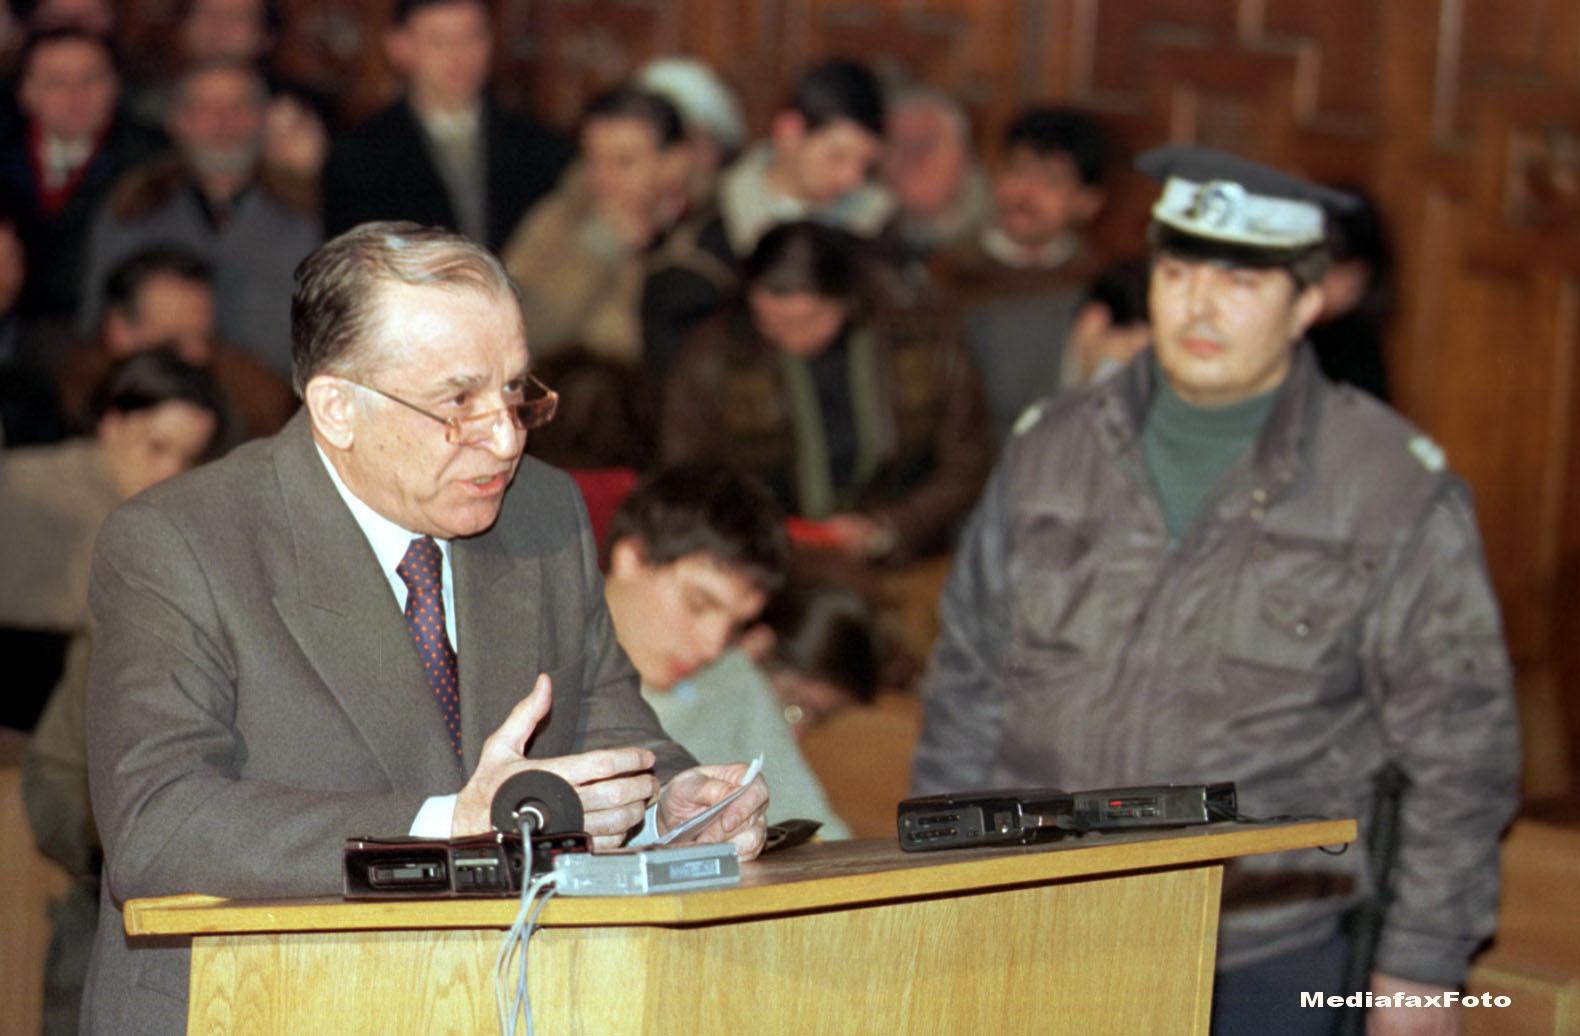 Dosarul Mineriadei. Ion Iliescu si Petre Roman, pusi sub acuzare. Marian Munteanu: